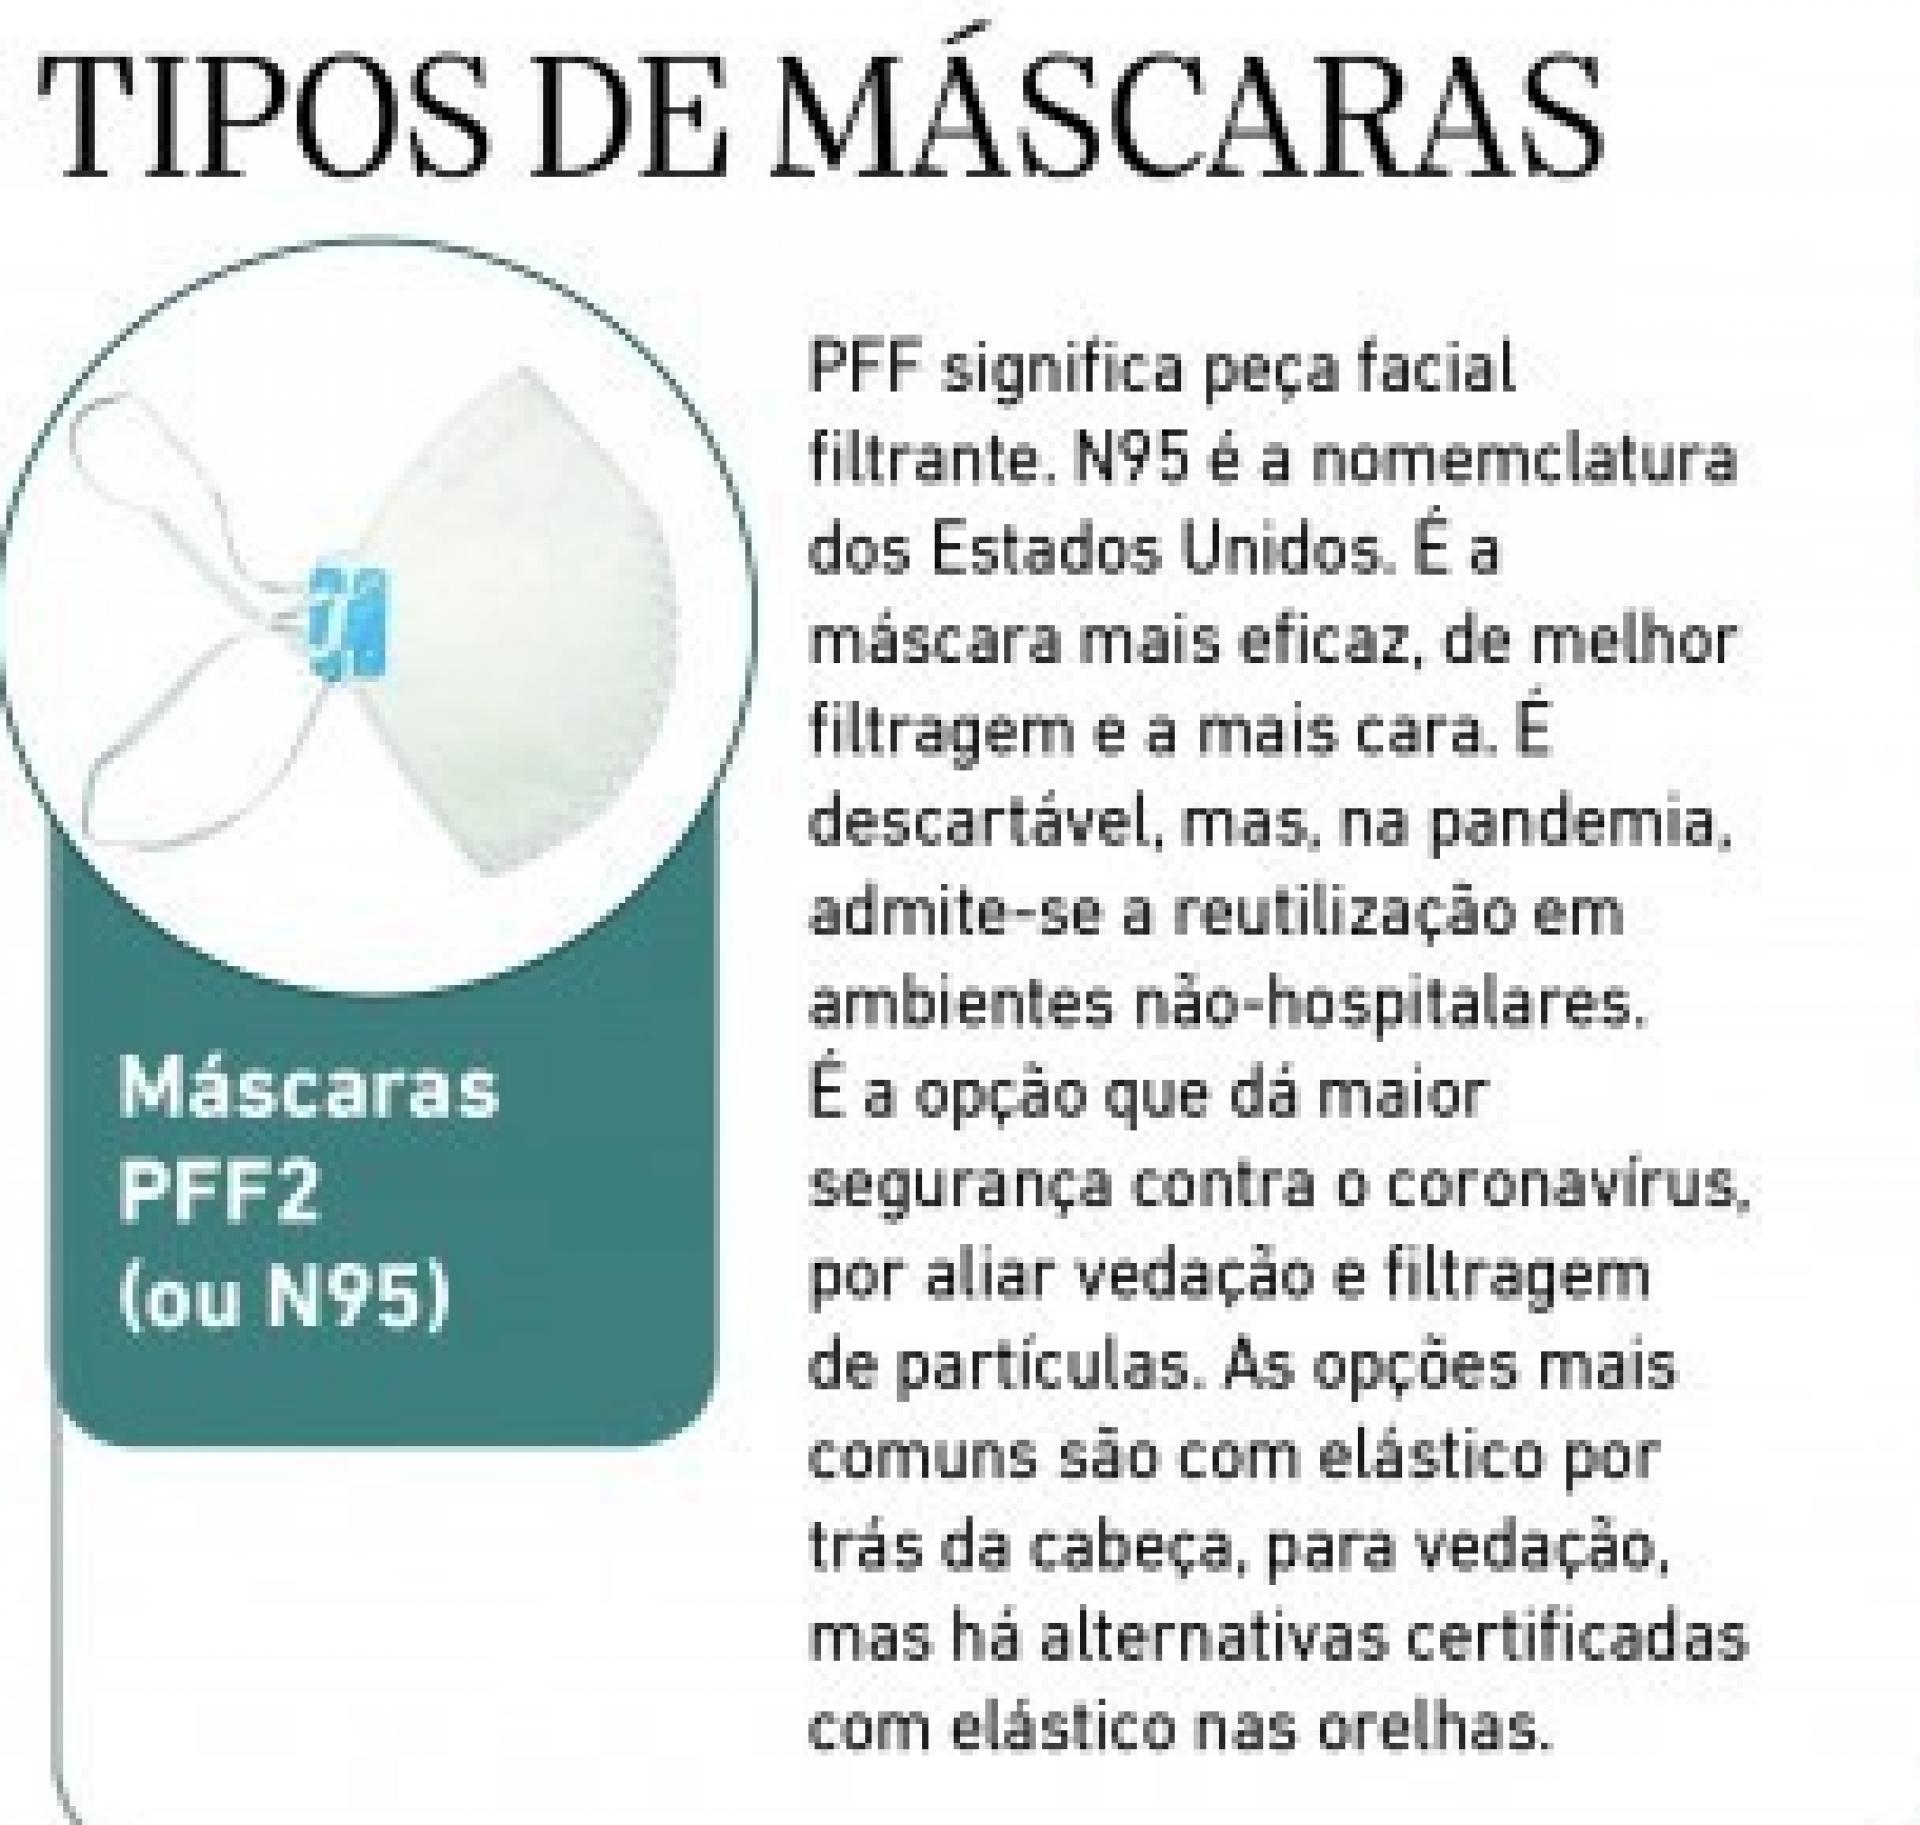 (Foto: O POVO)Tipos de máscaras